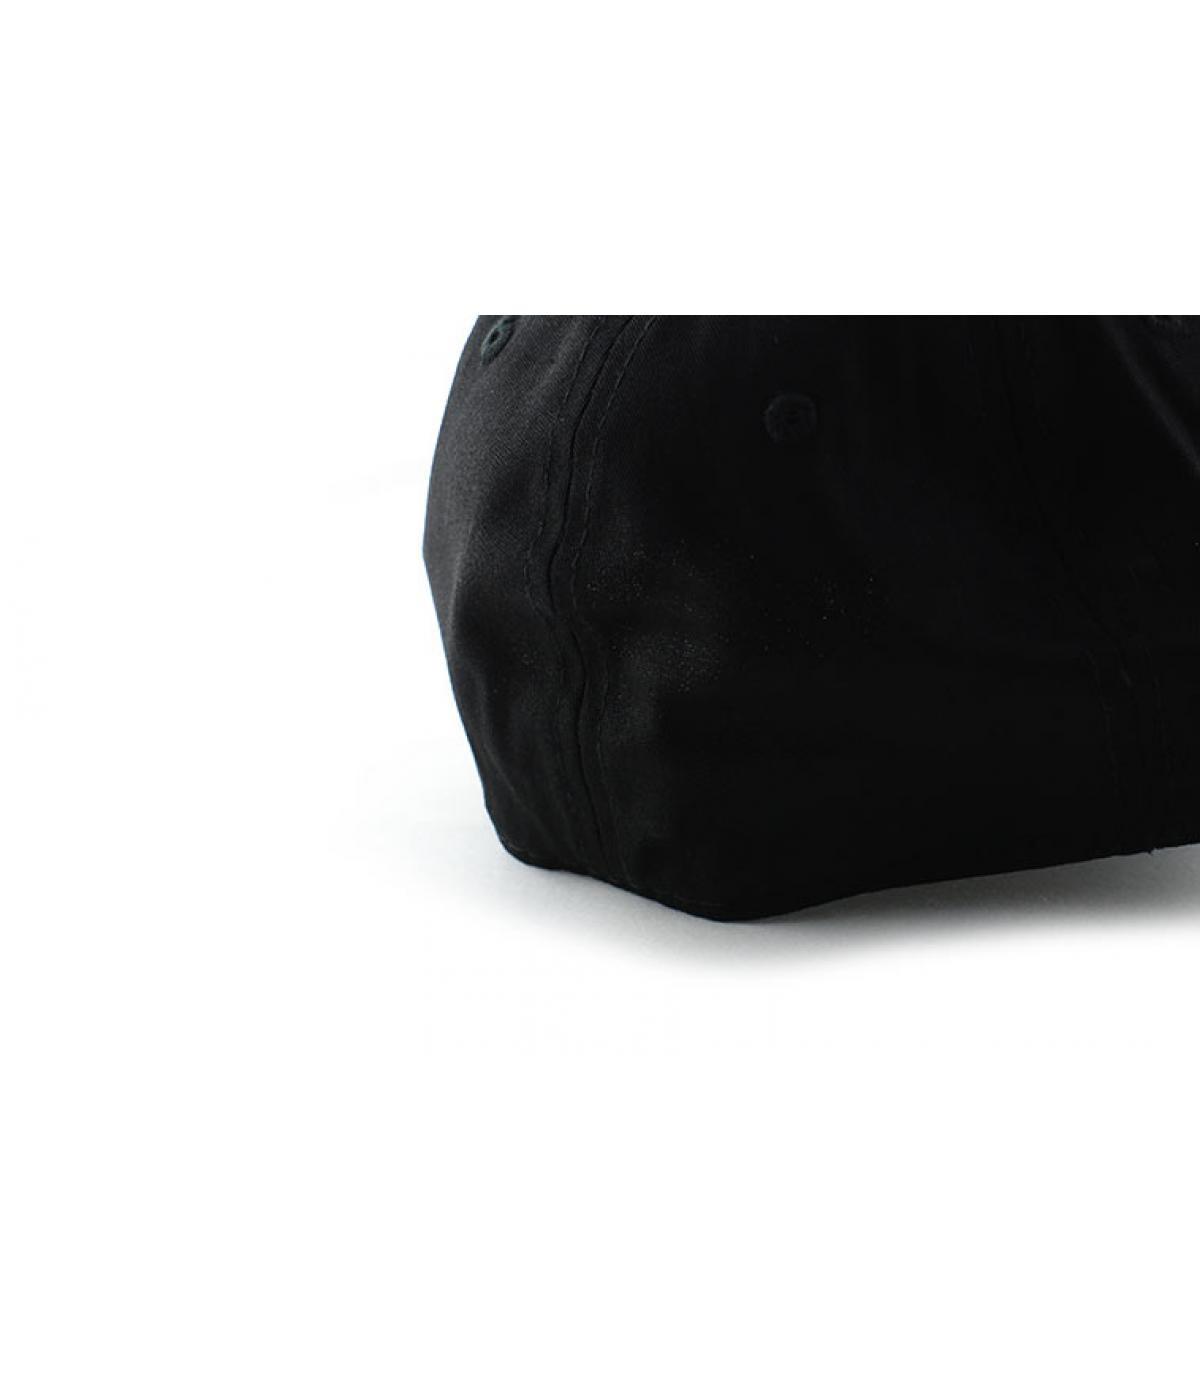 Details League Ess LA 39Thirty black white - Abbildung 5